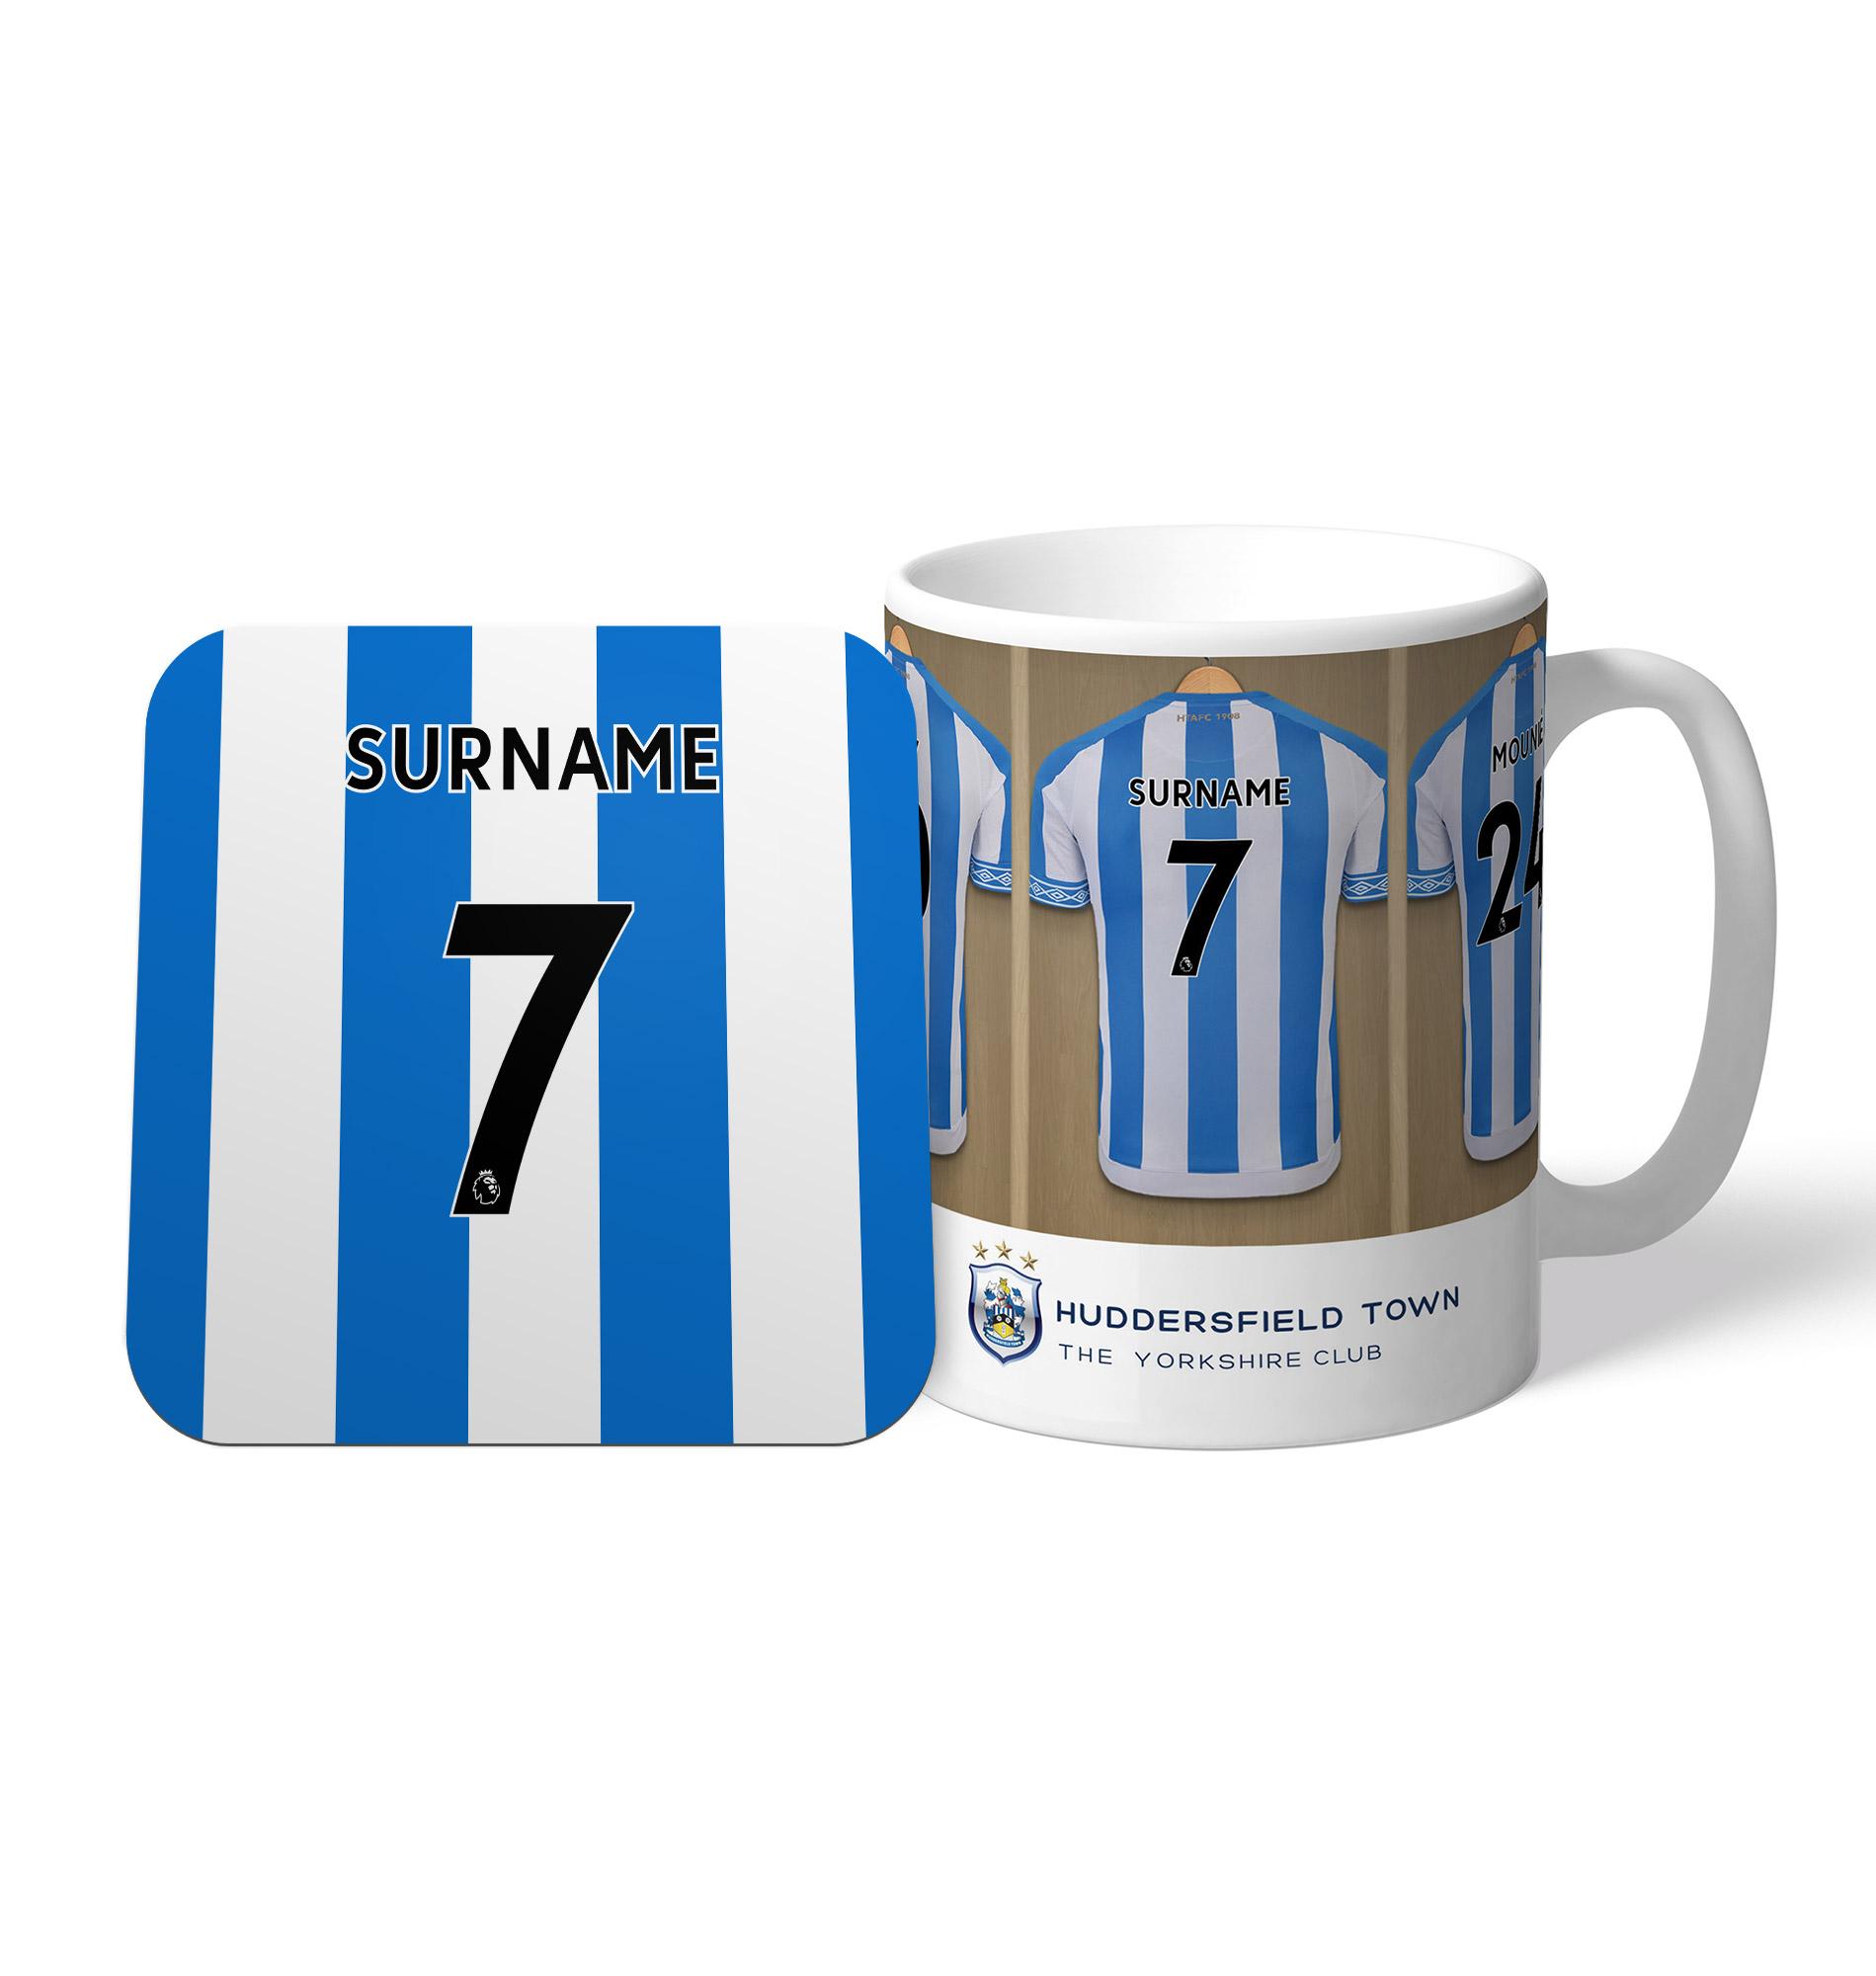 Huddersfield Town AFC Dressing Room Mug & Coaster Set